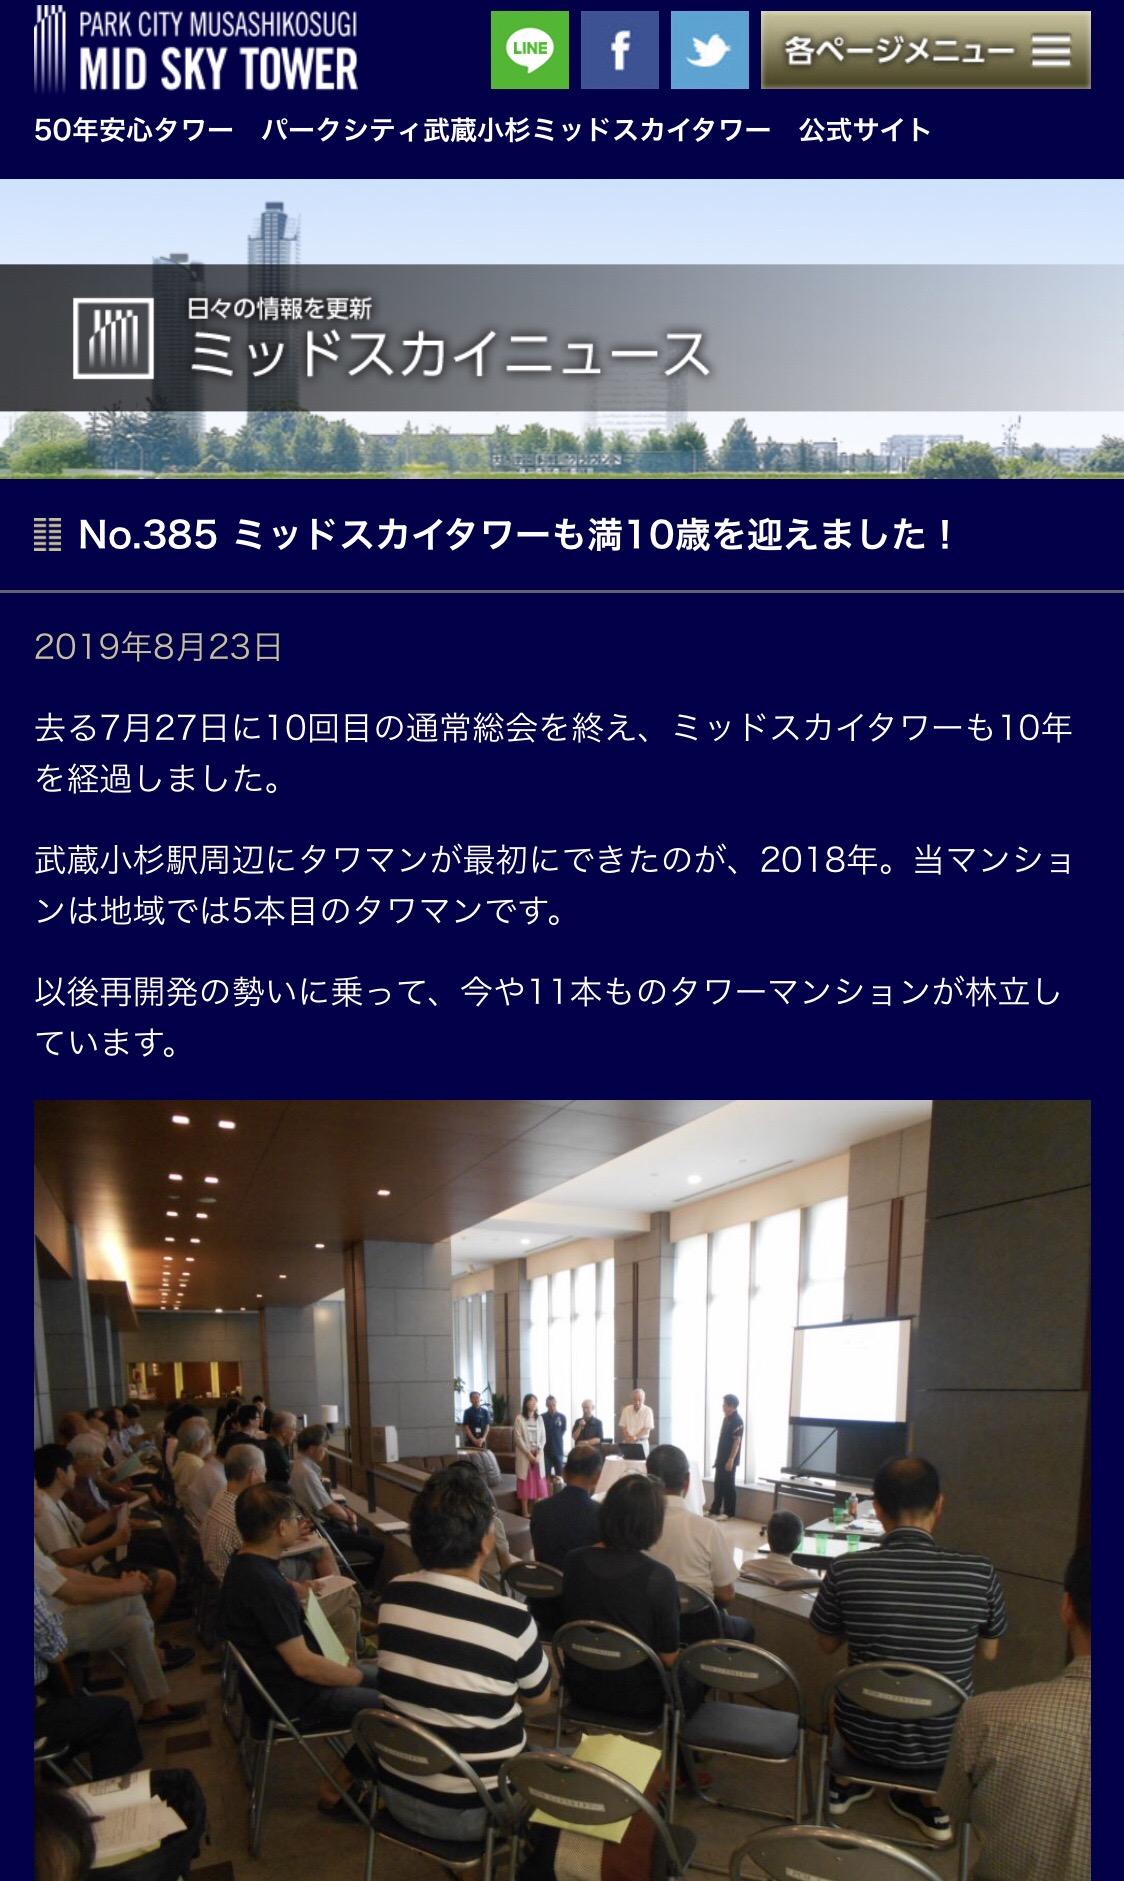 人災 不可抗力 水害 多摩川 司法に関連した画像-02